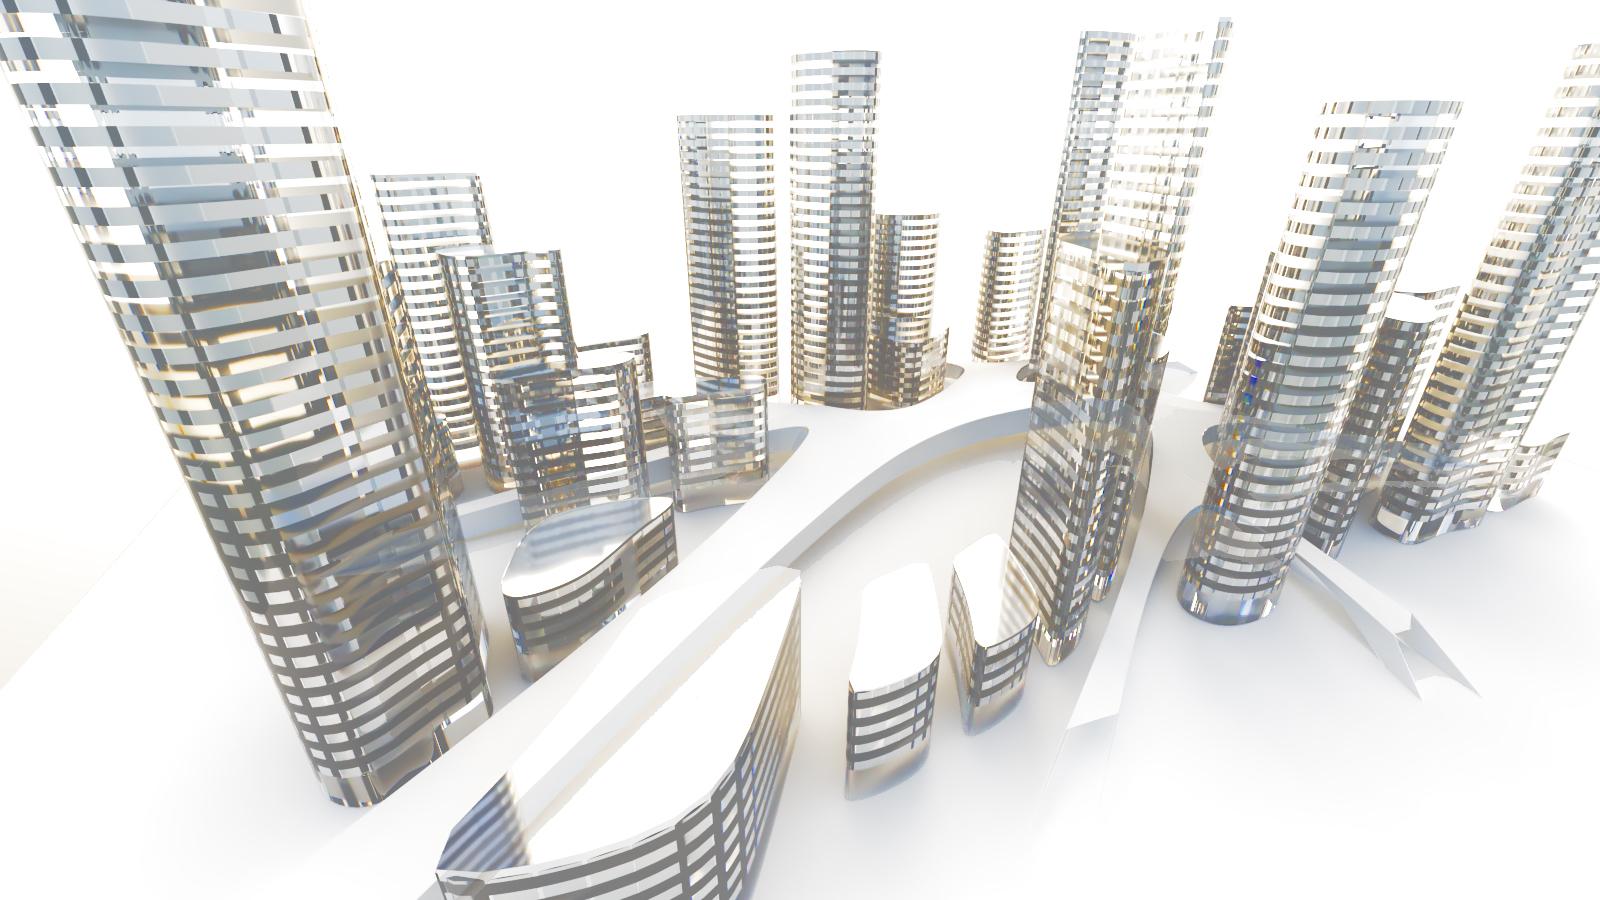 RHINOCEROSとGRASSHOPPERですぐにできるハッタリ未来都市の作り方